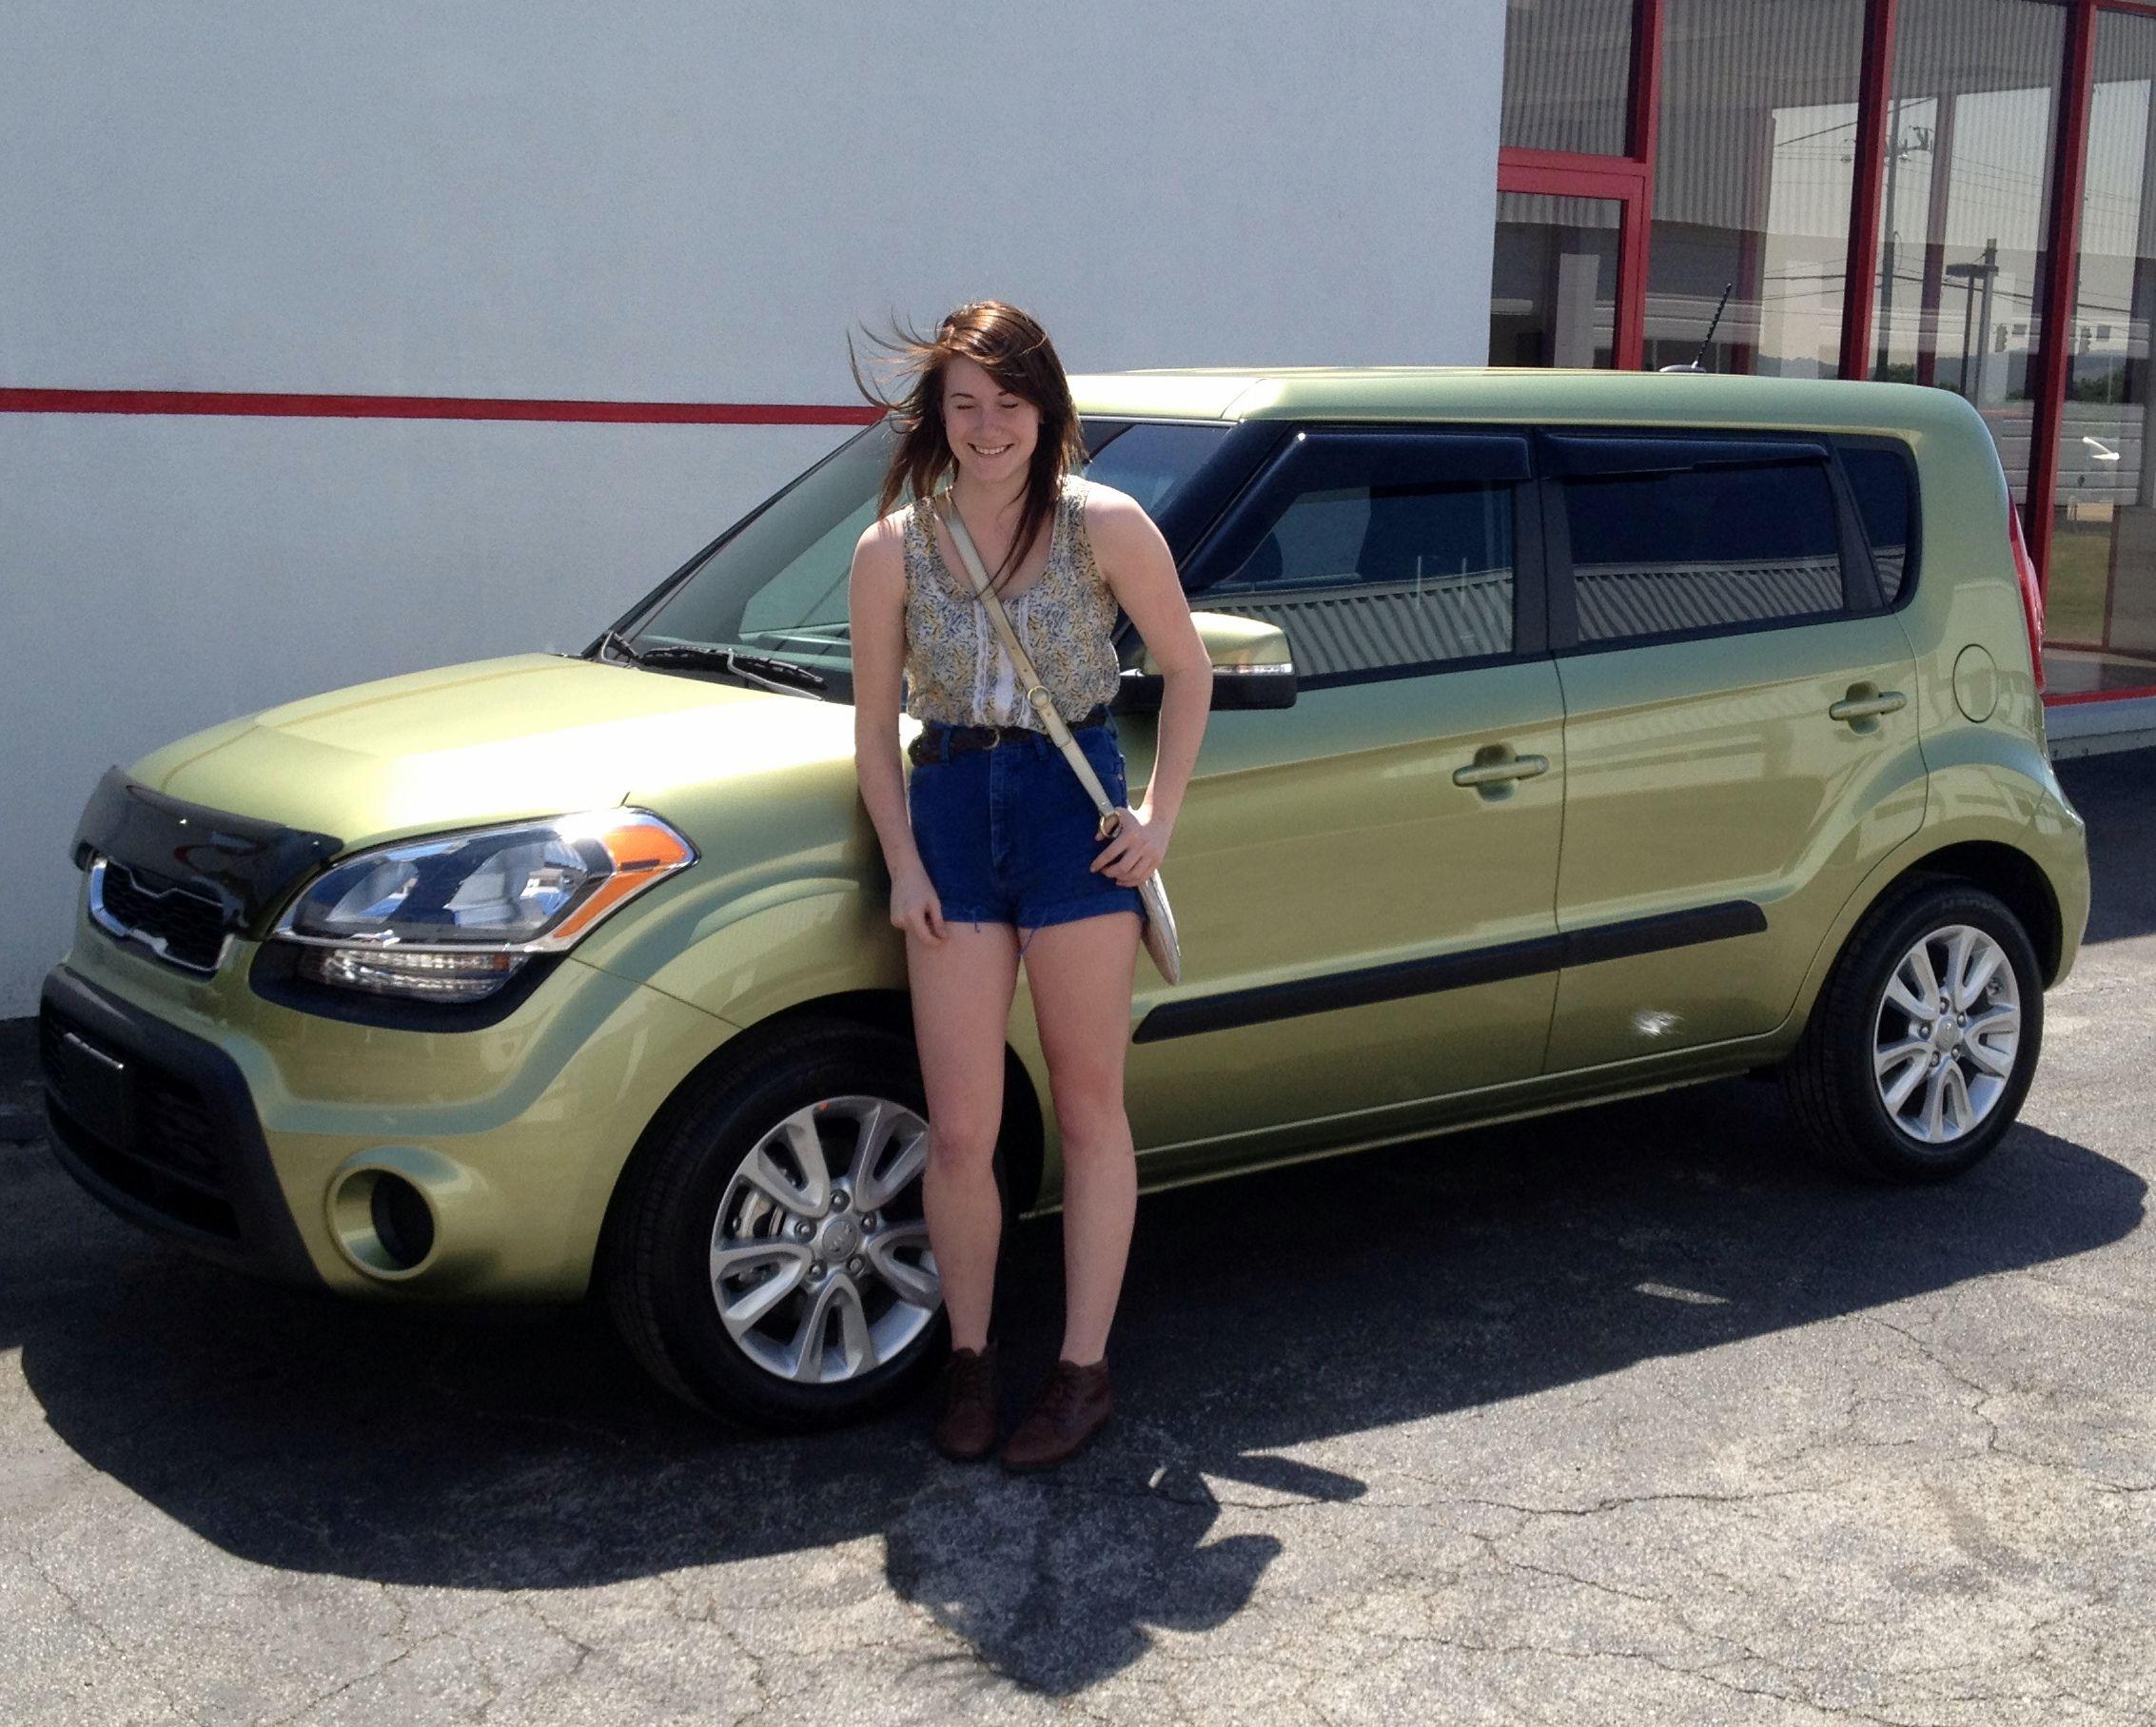 Grace Mills in front of her very first car A 2012 Kia Soul in Alien